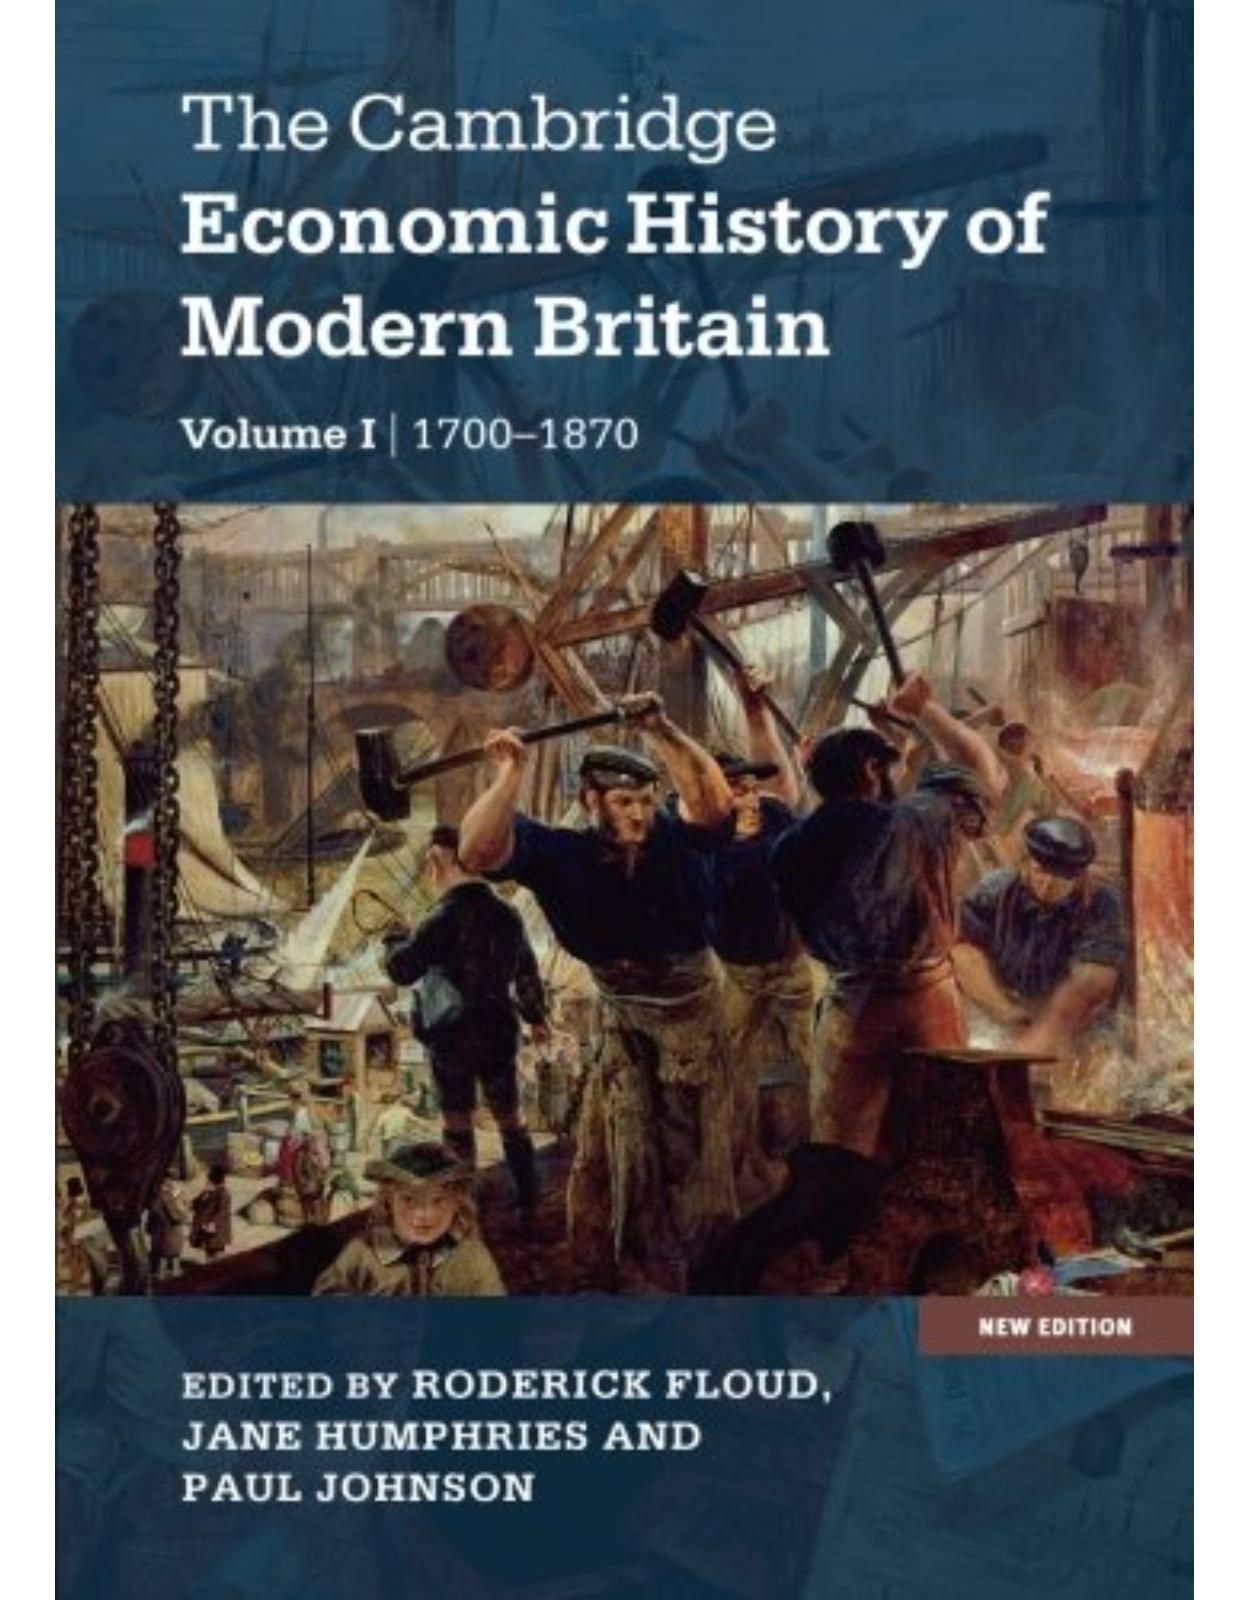 The Cambridge Economic History of Modern Britain: Volume 1